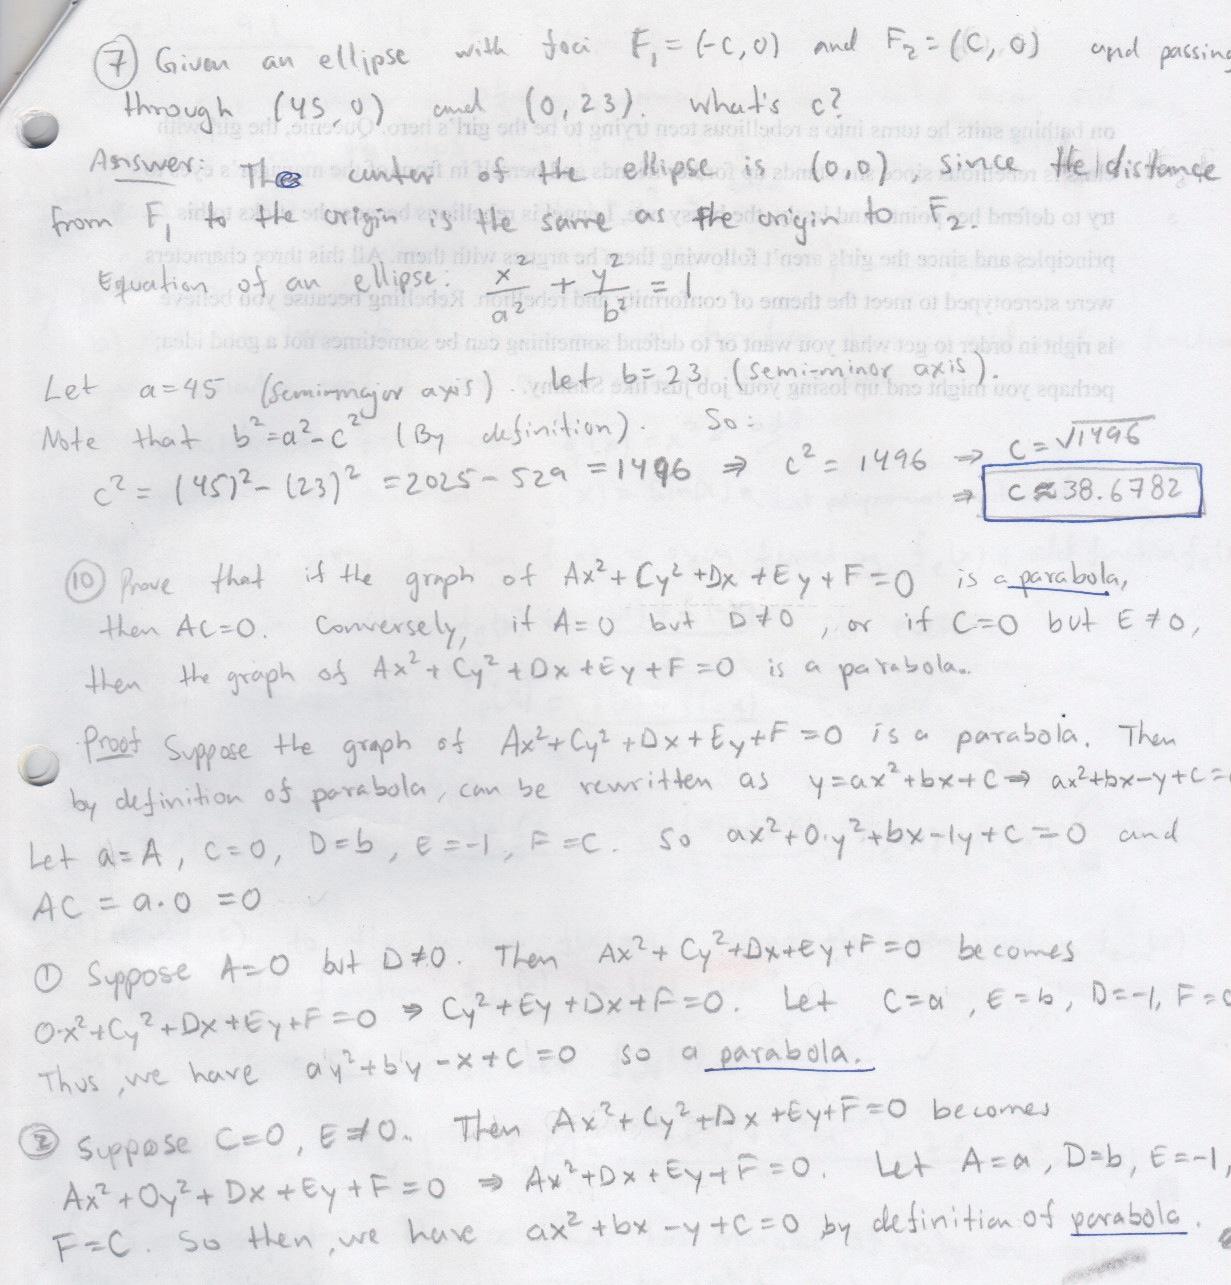 My old math homework from UC Berkeley : Math 152 hw4